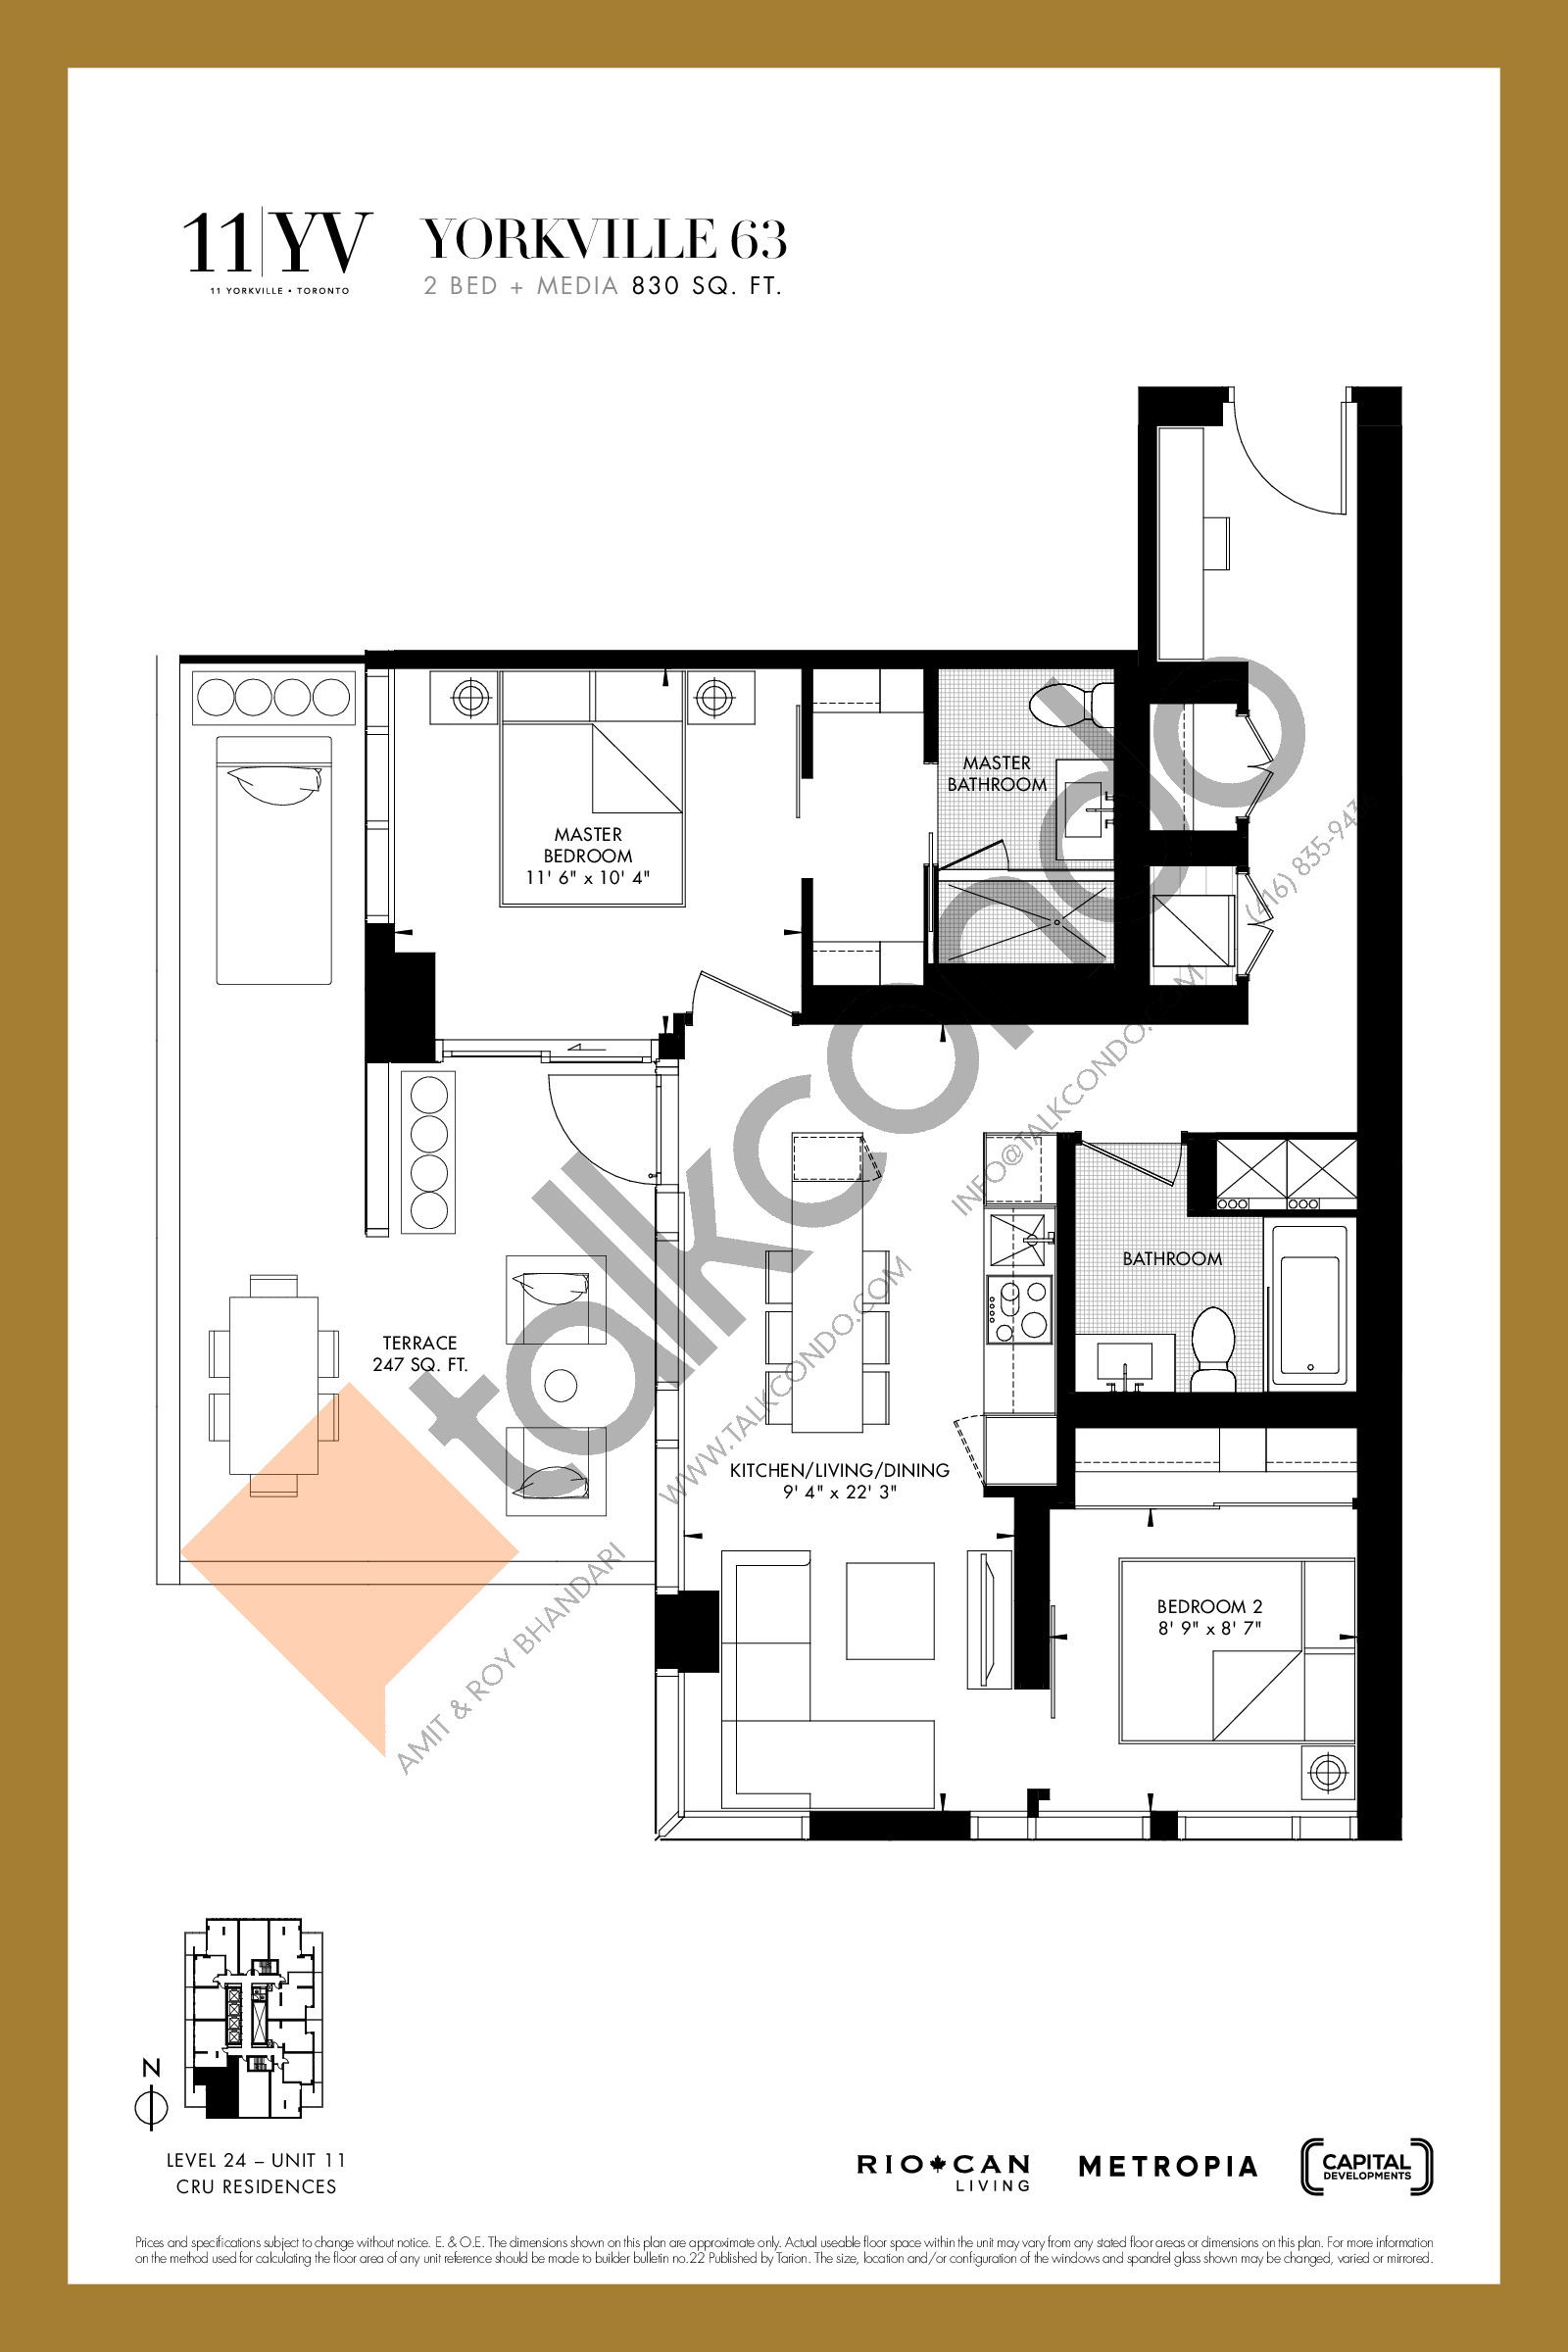 Yorkville 63 Floor Plan at 11YV Condos - 830 sq.ft